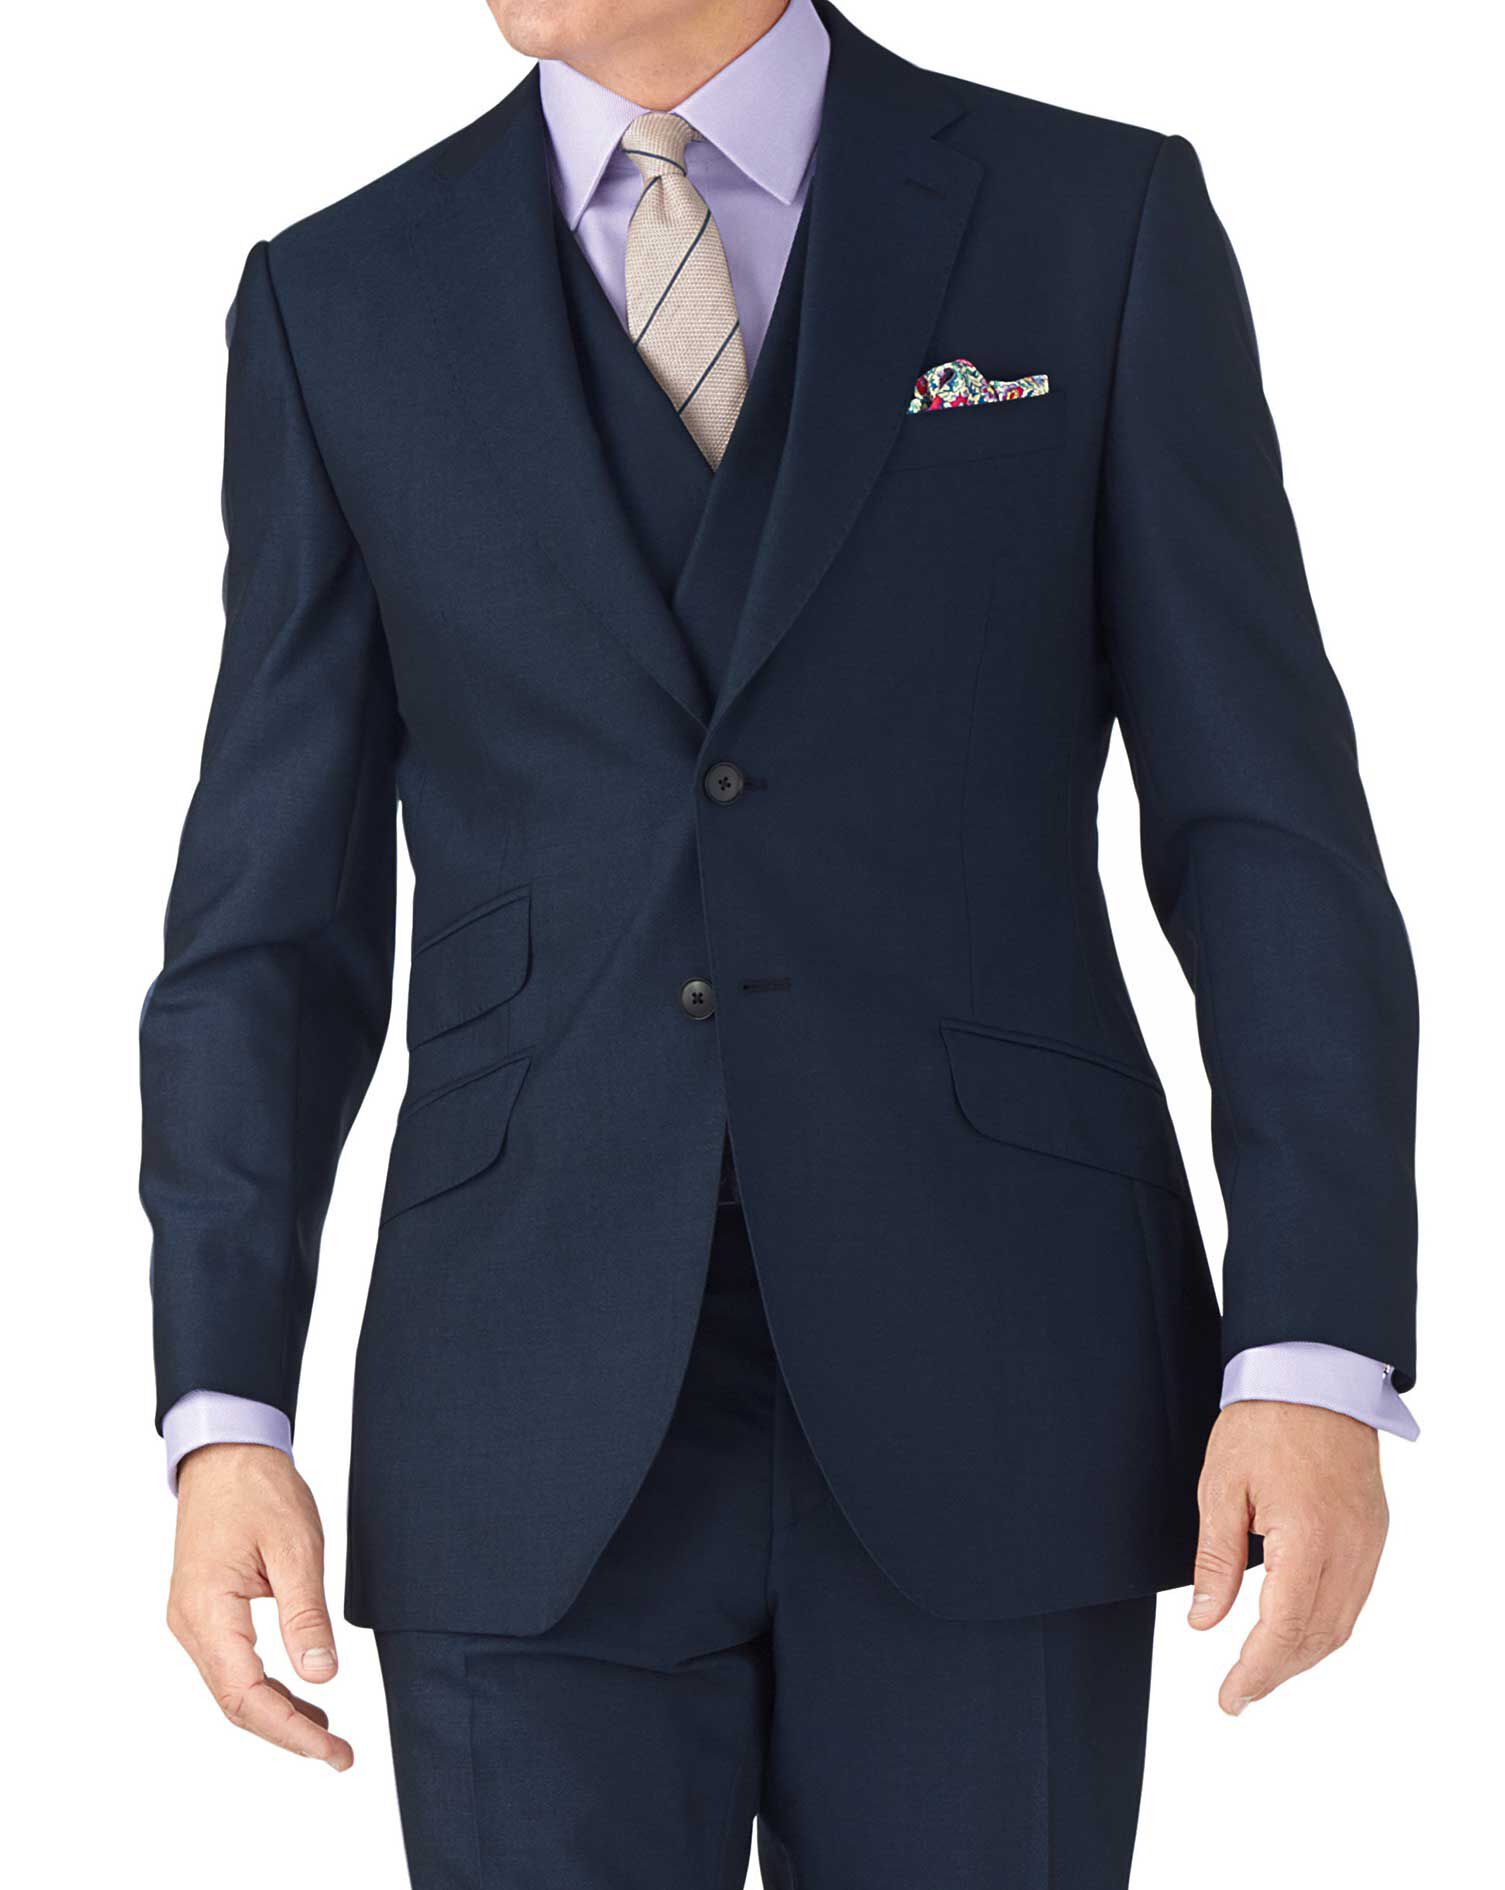 Blue Slim Fit British Panama Luxury Suit Wool Jacket Size 36 Short by Charles Tyrwhitt